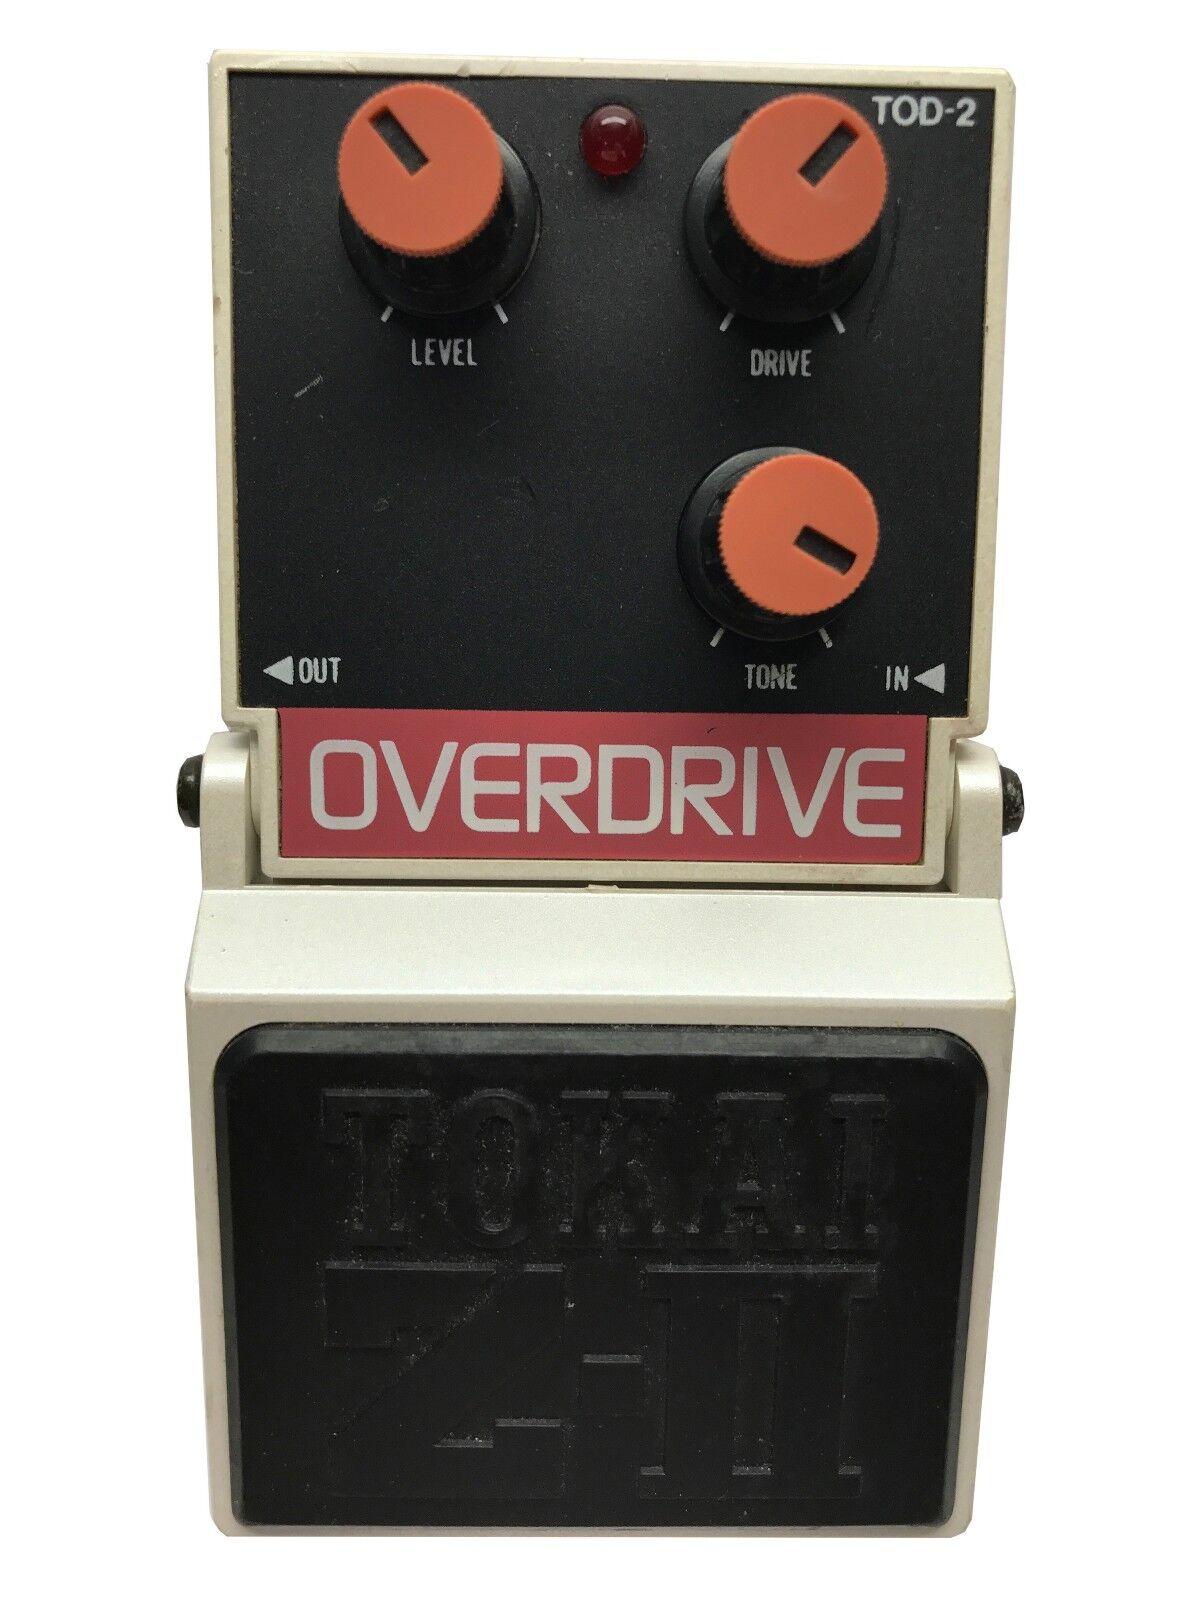 Tokai TOD-2, Overdrive, Z-II Super Effects series, MIJ, 1980's, Vintage Effect